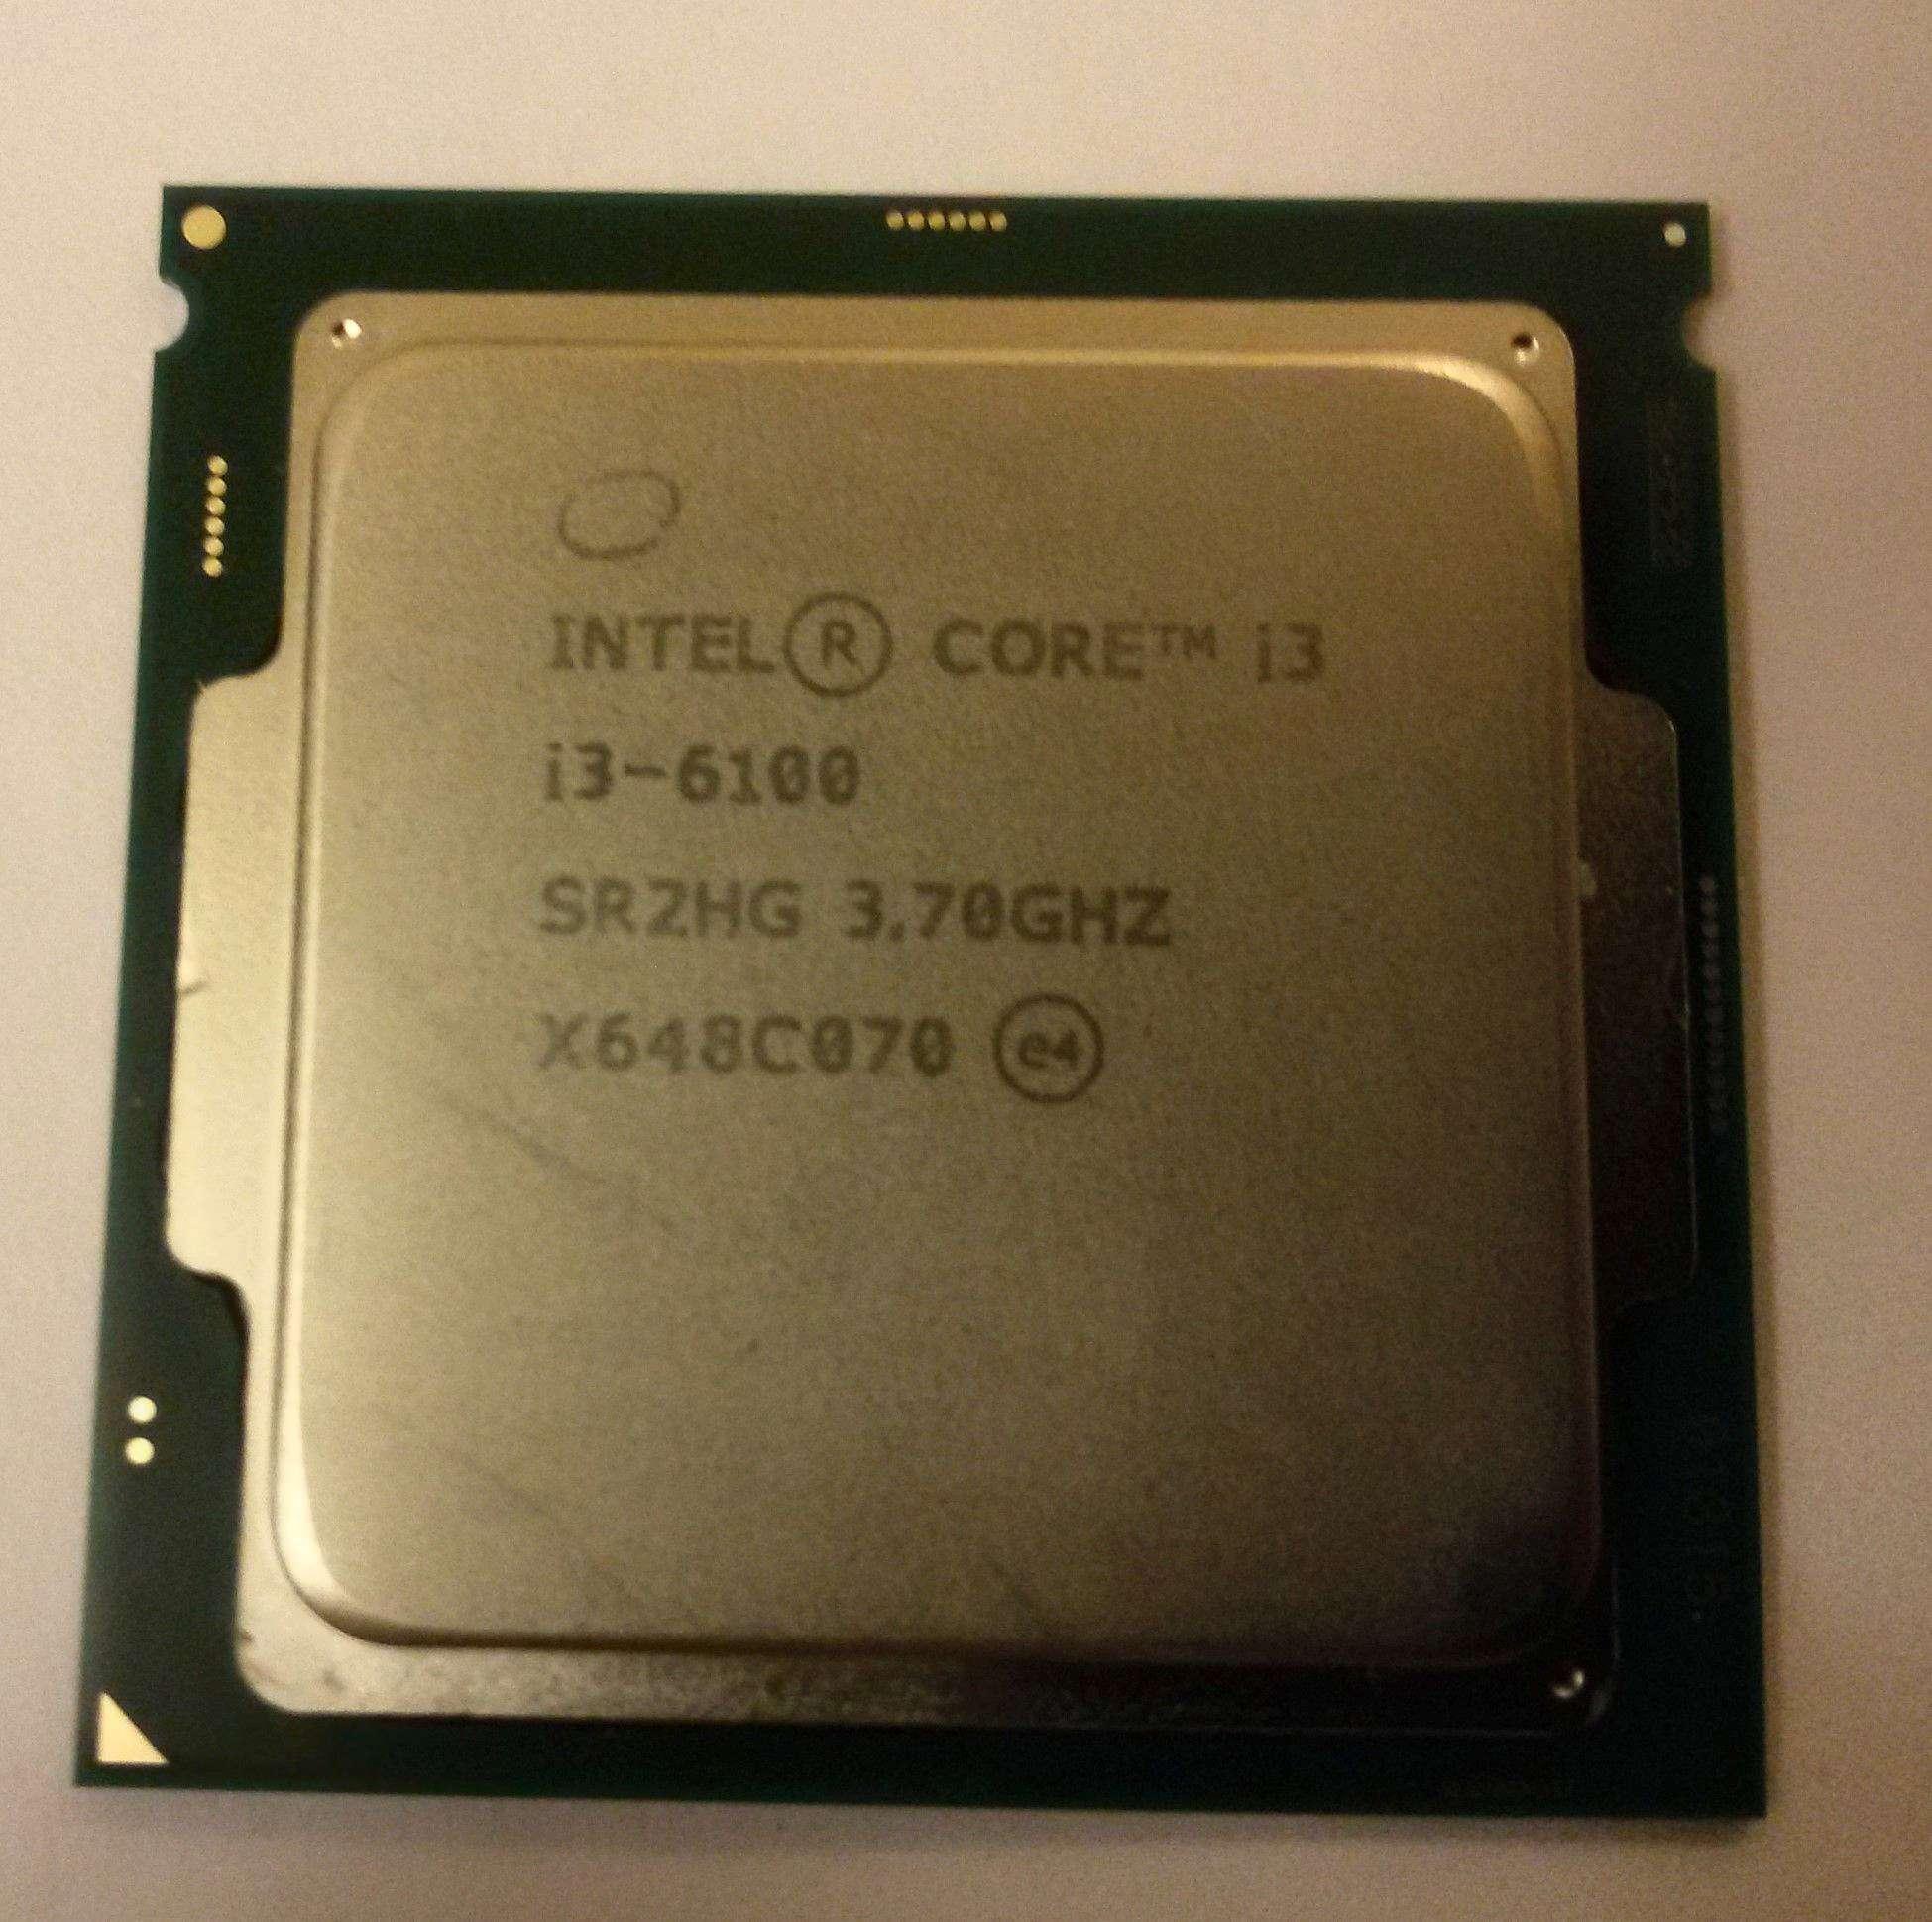 Harga Jual Intel Core I3 6100 Skylake I5 6600 33ghz Cache 6mb Box Socket Lga 1151 Series Lga1151